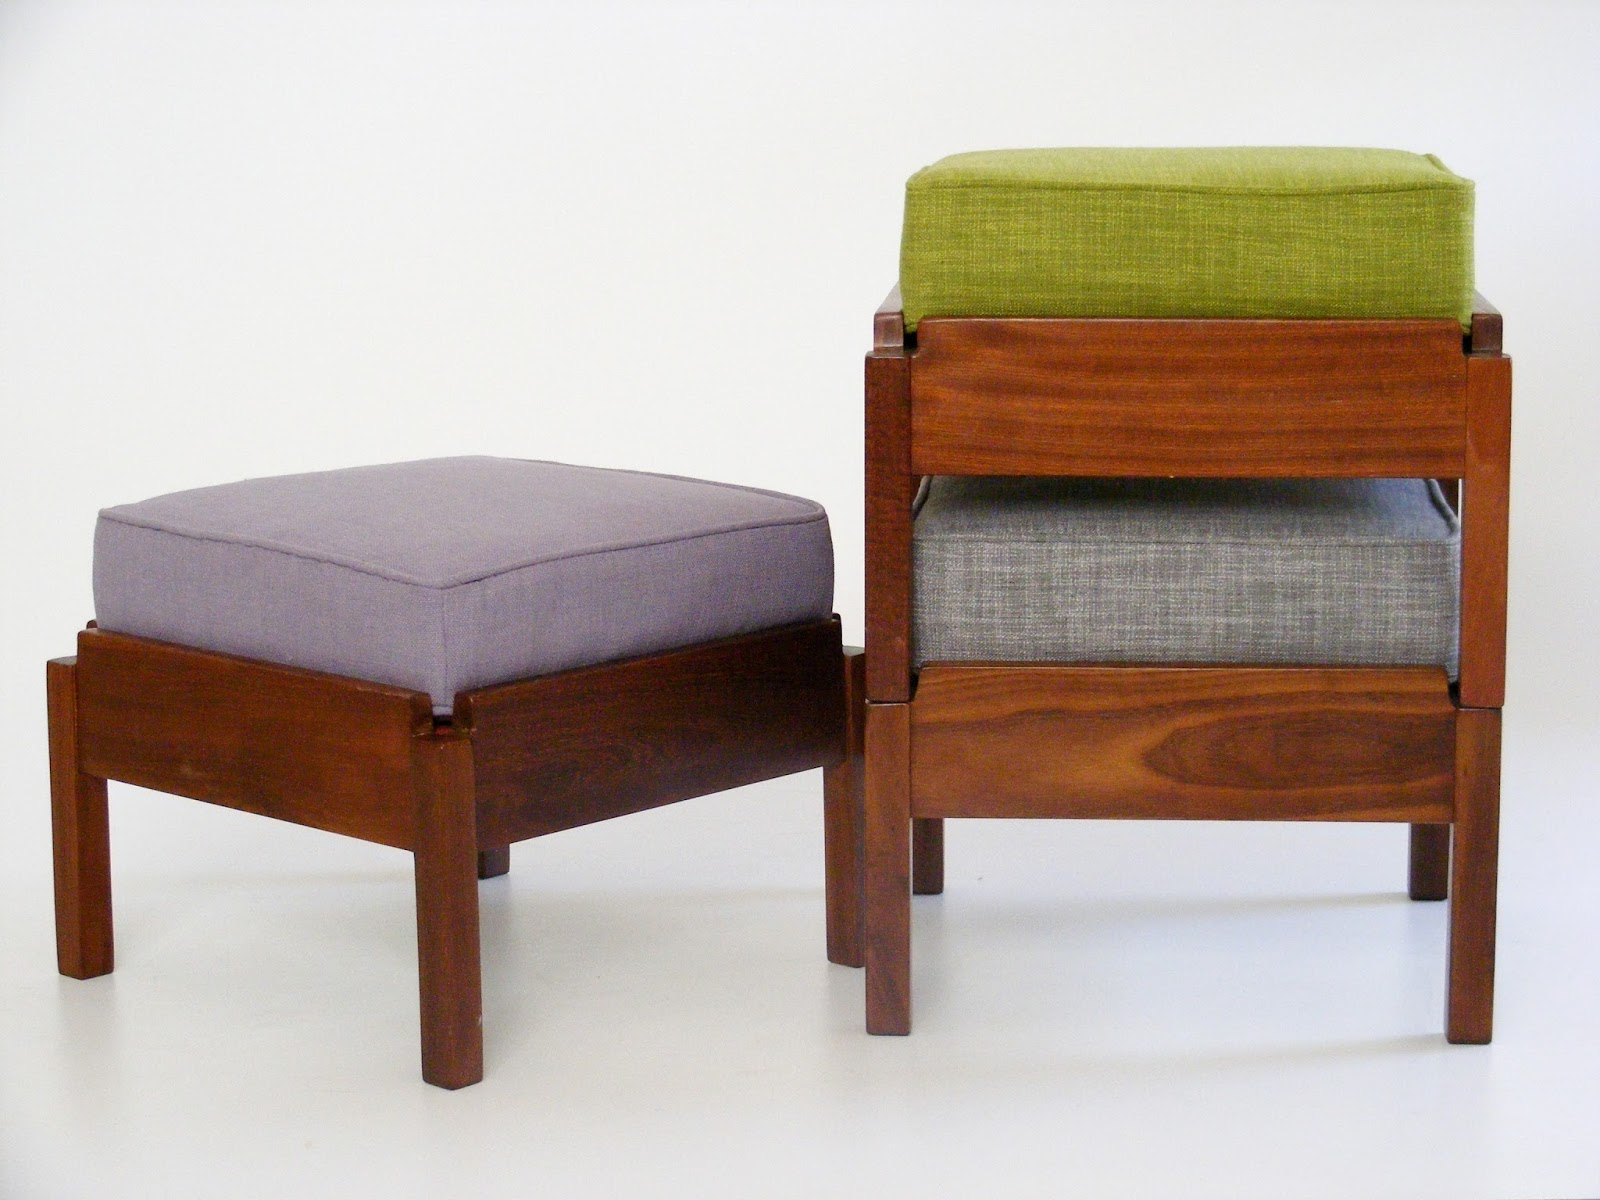 Vamp Furniture This Weeks New Vintage Furniture Stock At Vamp 26 February 2016